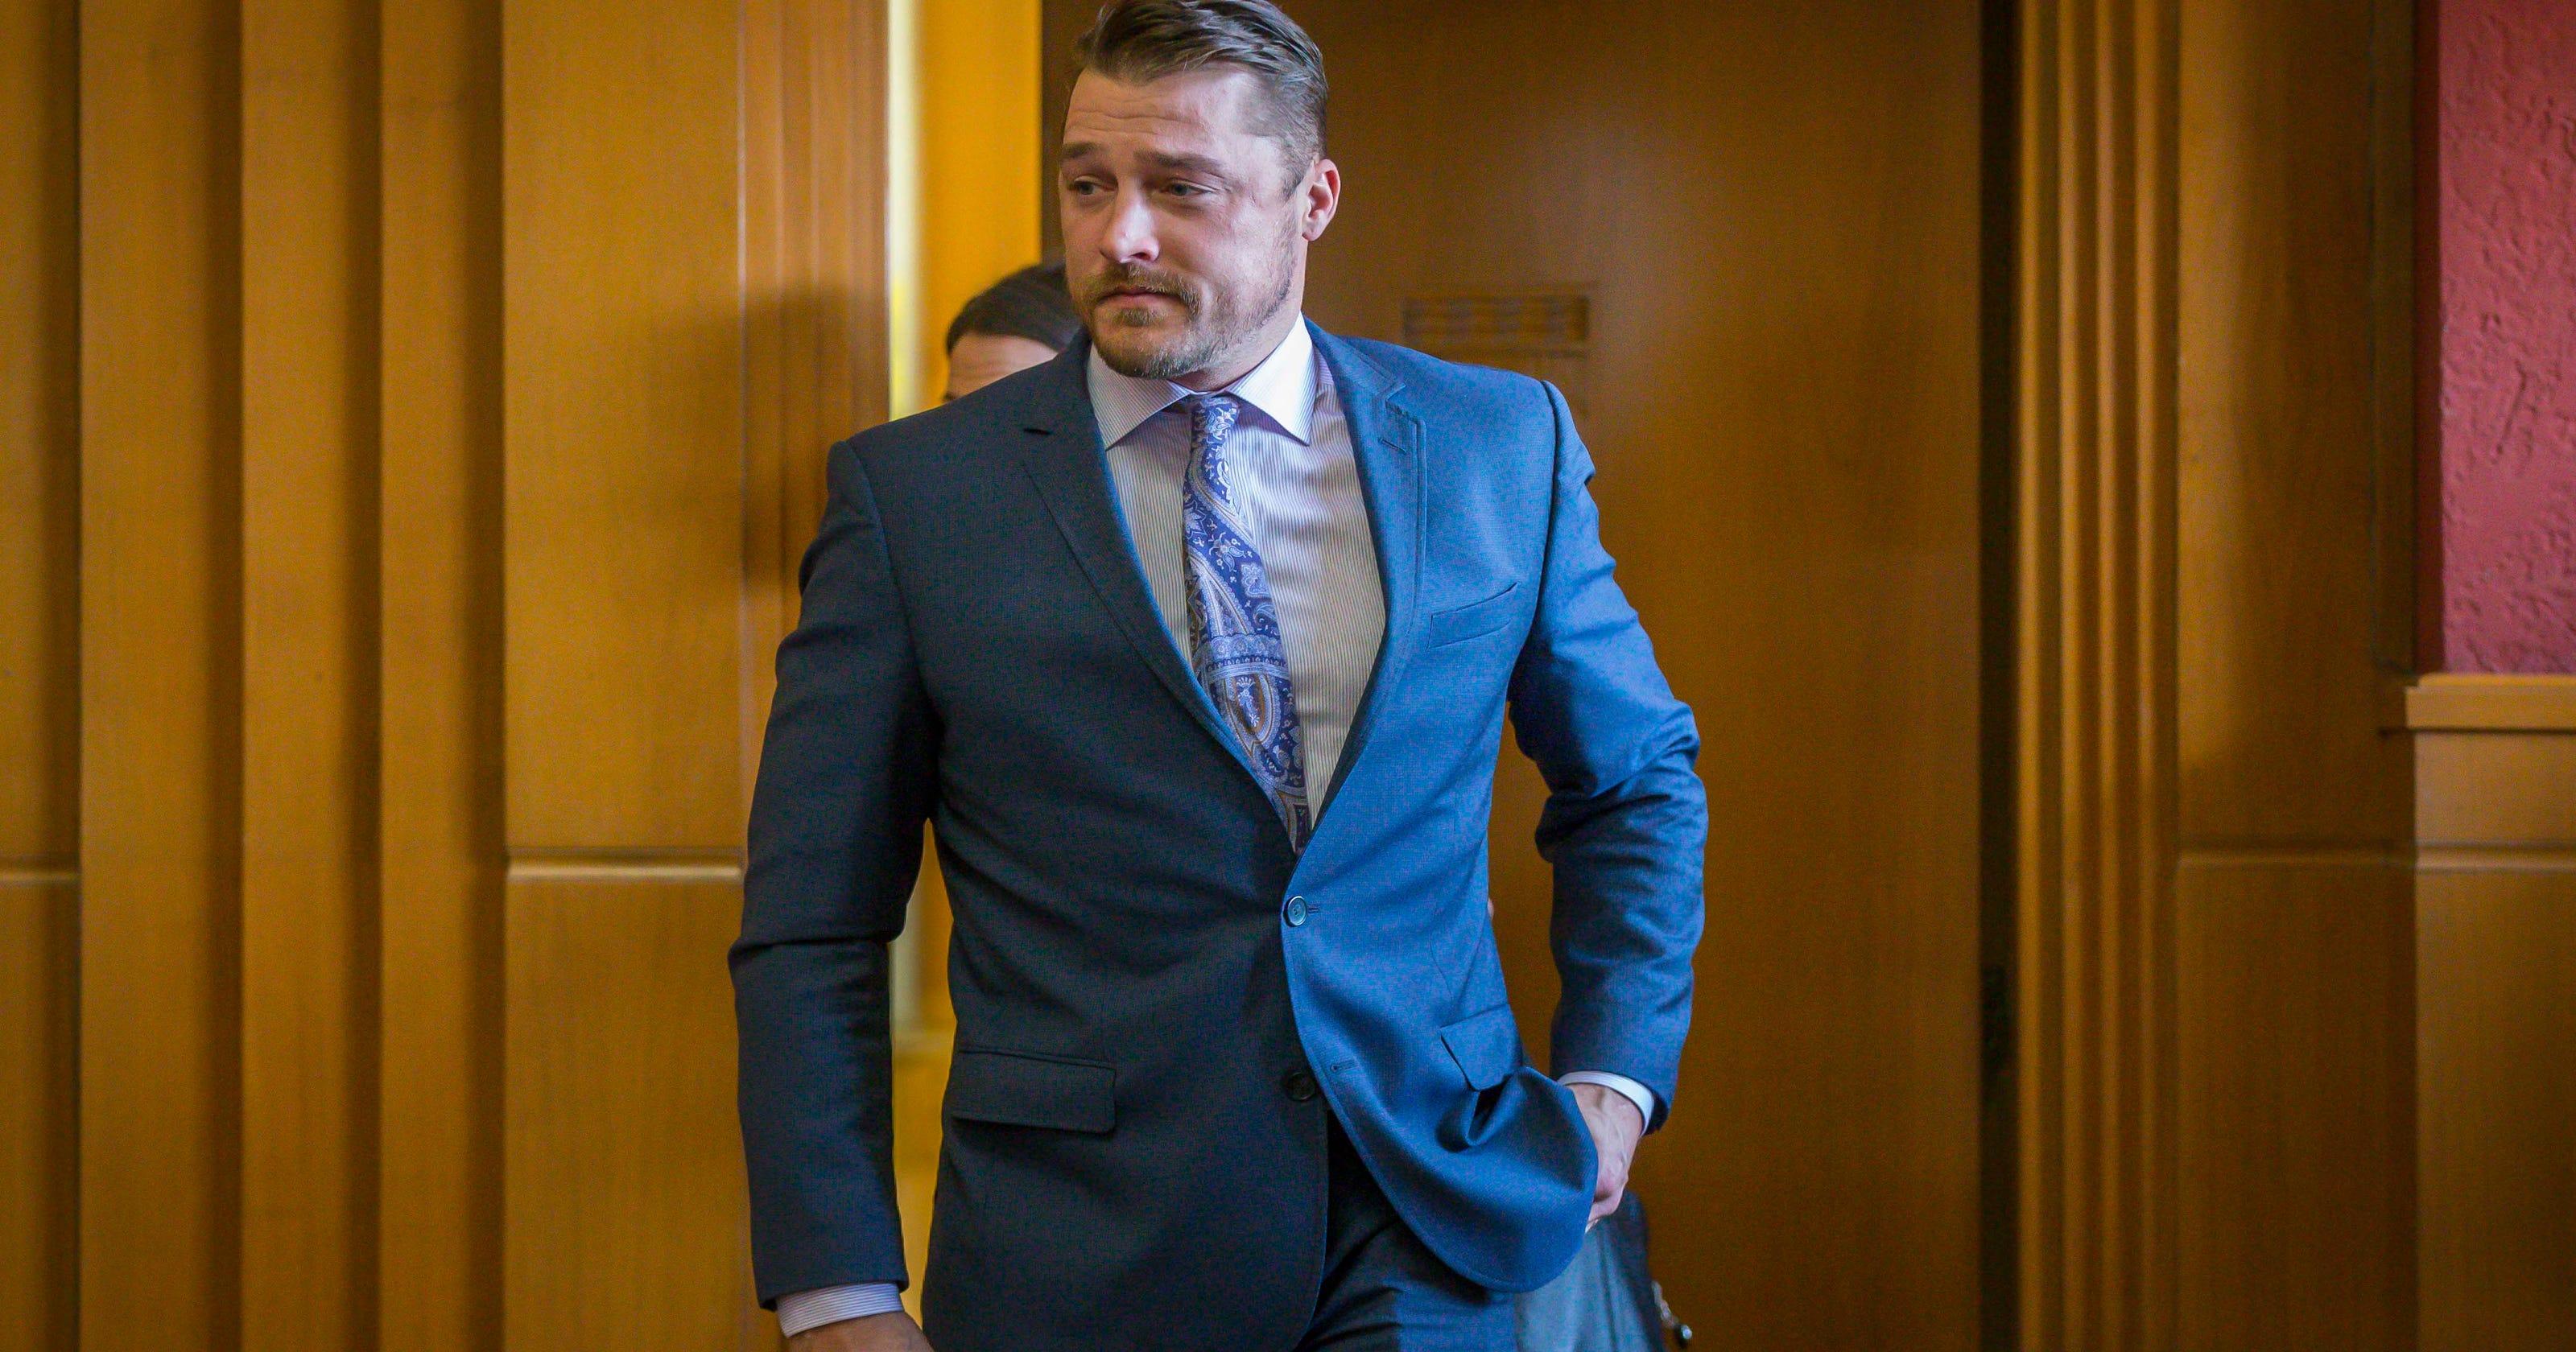 Chris Soules: 'Bachelor' star appeal denied, jury trial ...